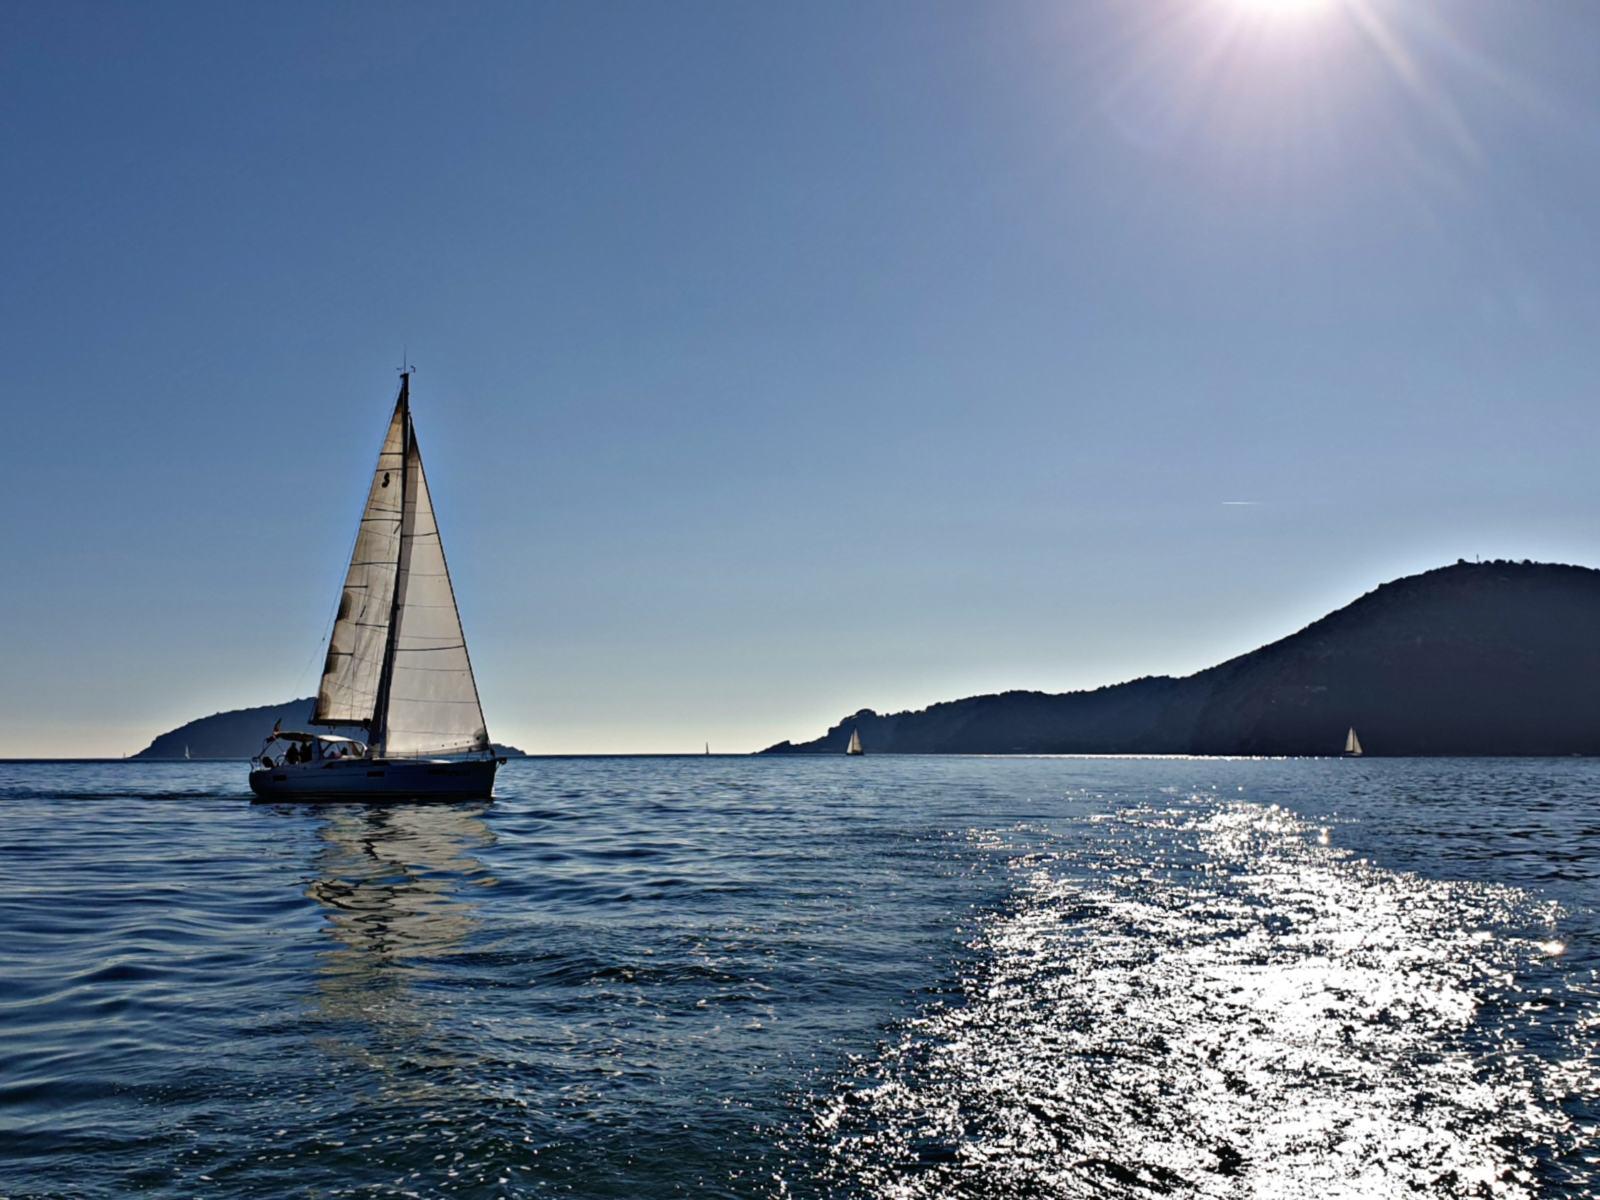 Veleggiando nel Golfo dei Poeti